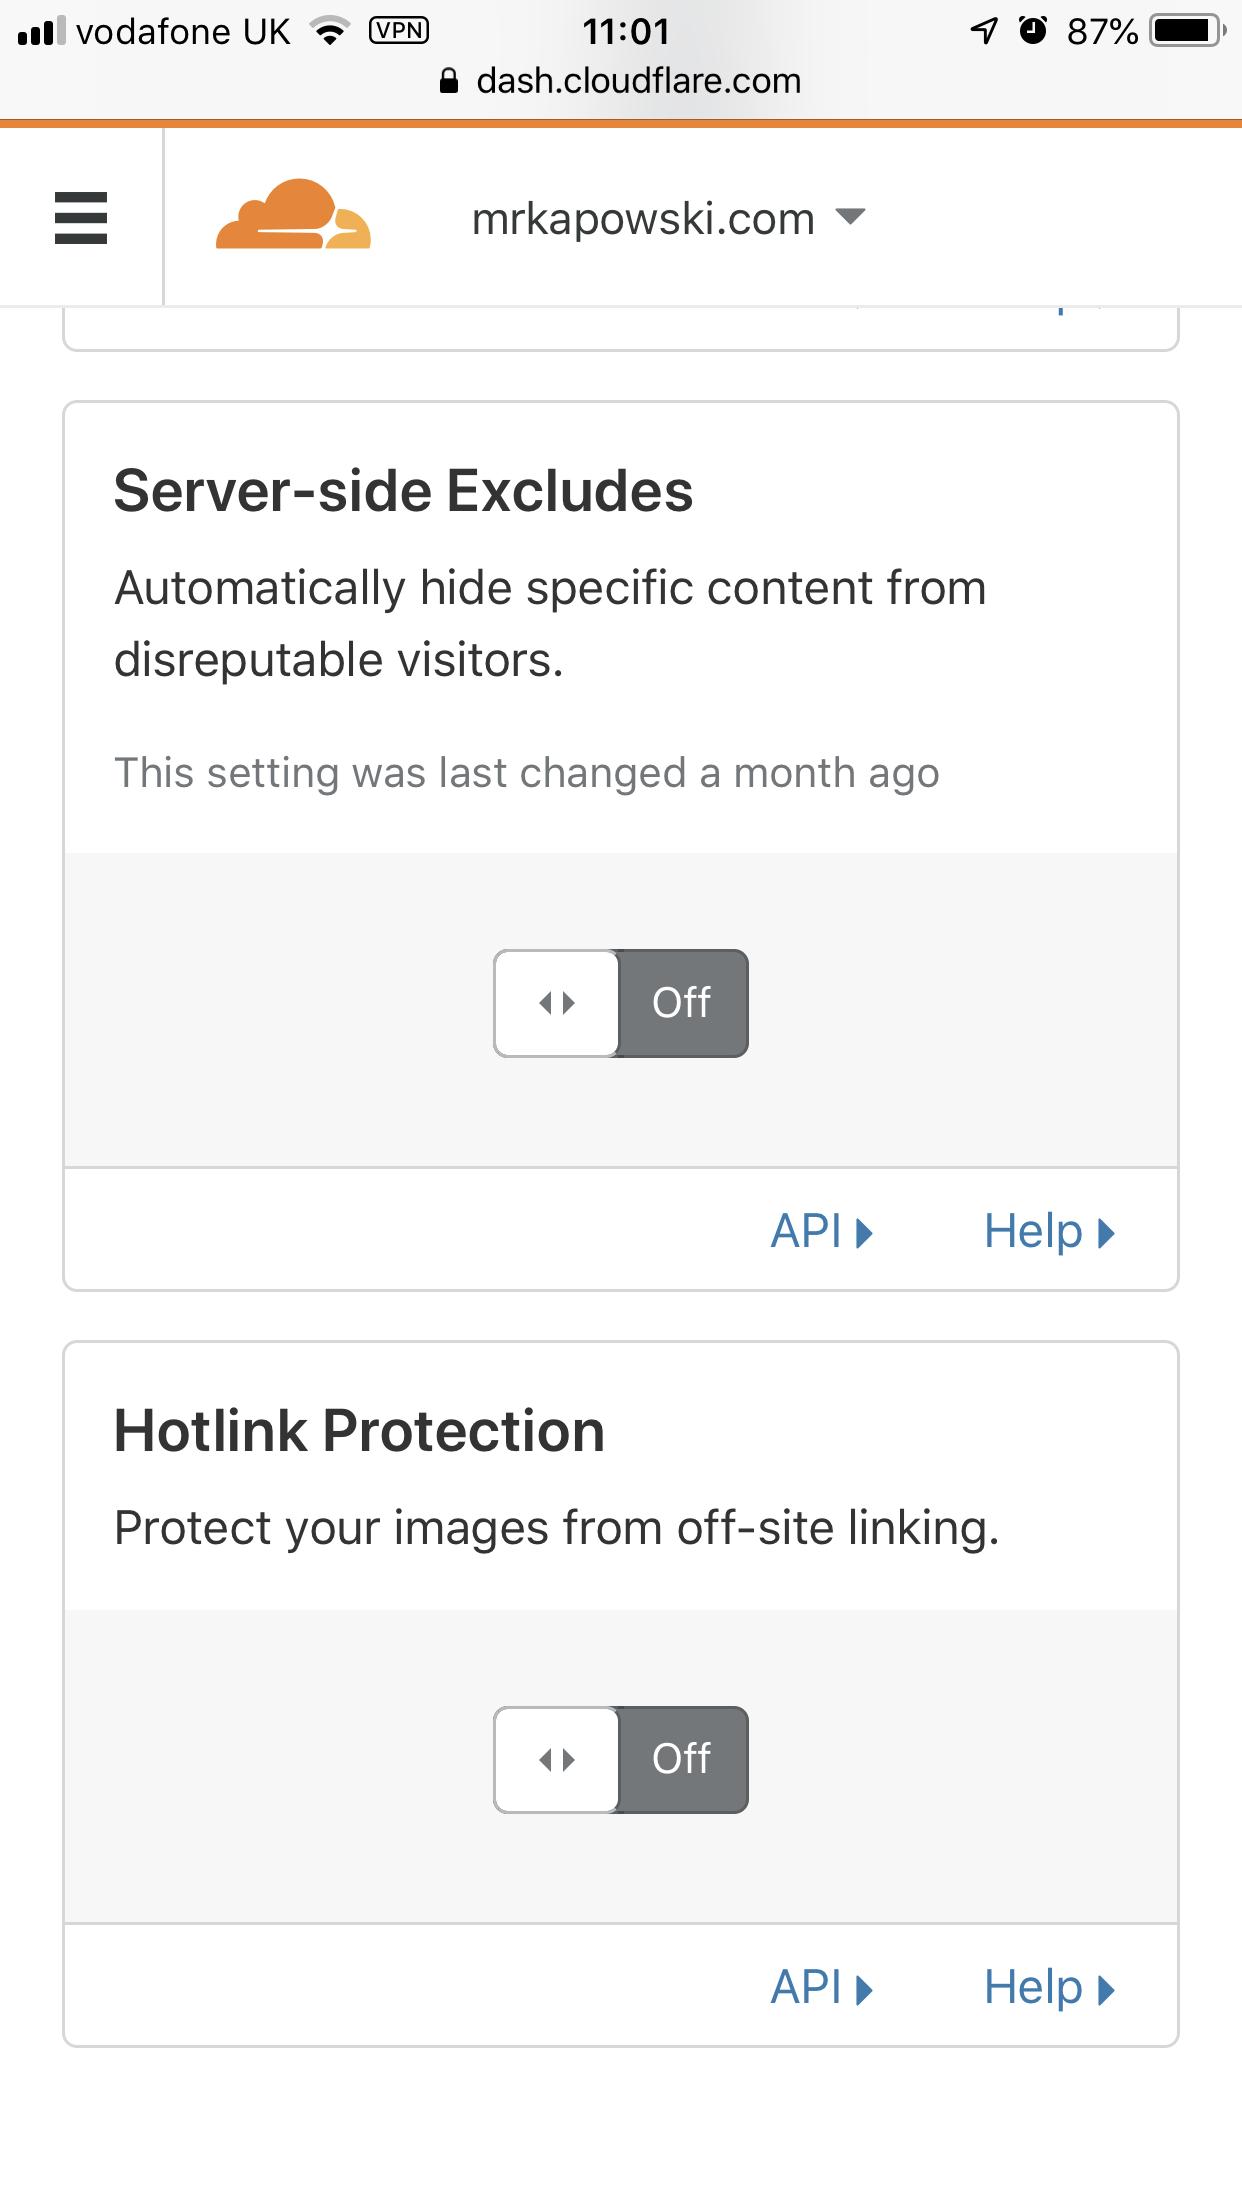 Experiences with Cloudflare blocking Bridgy | Mr Kapowski